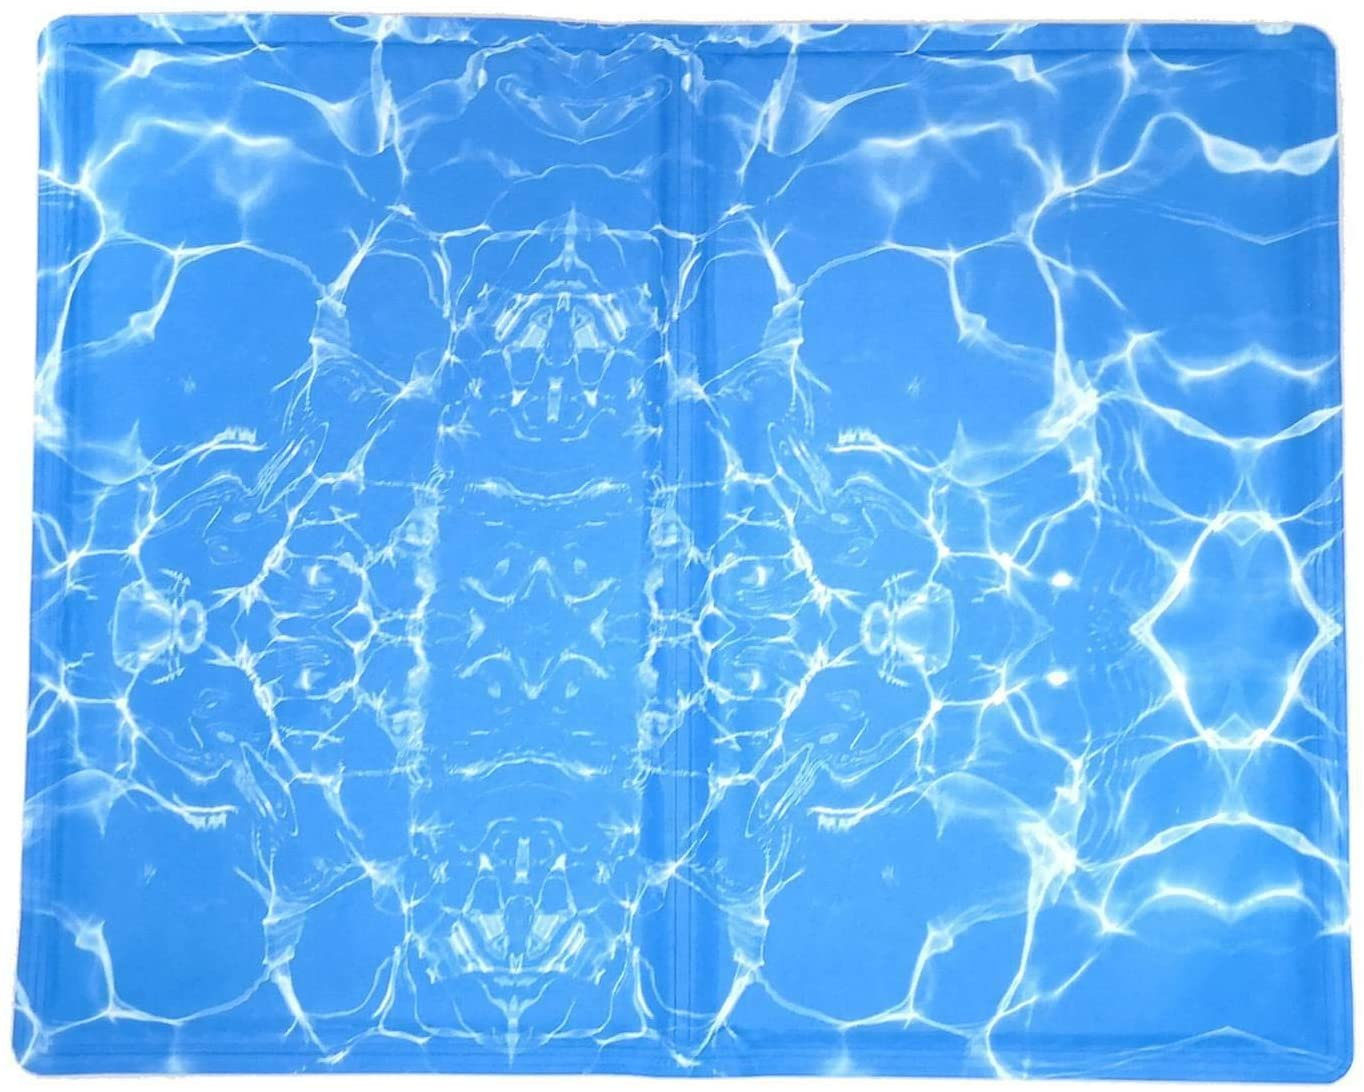 Kühlmatte für Hunde 50 x 40 cm, blau Wellendesign